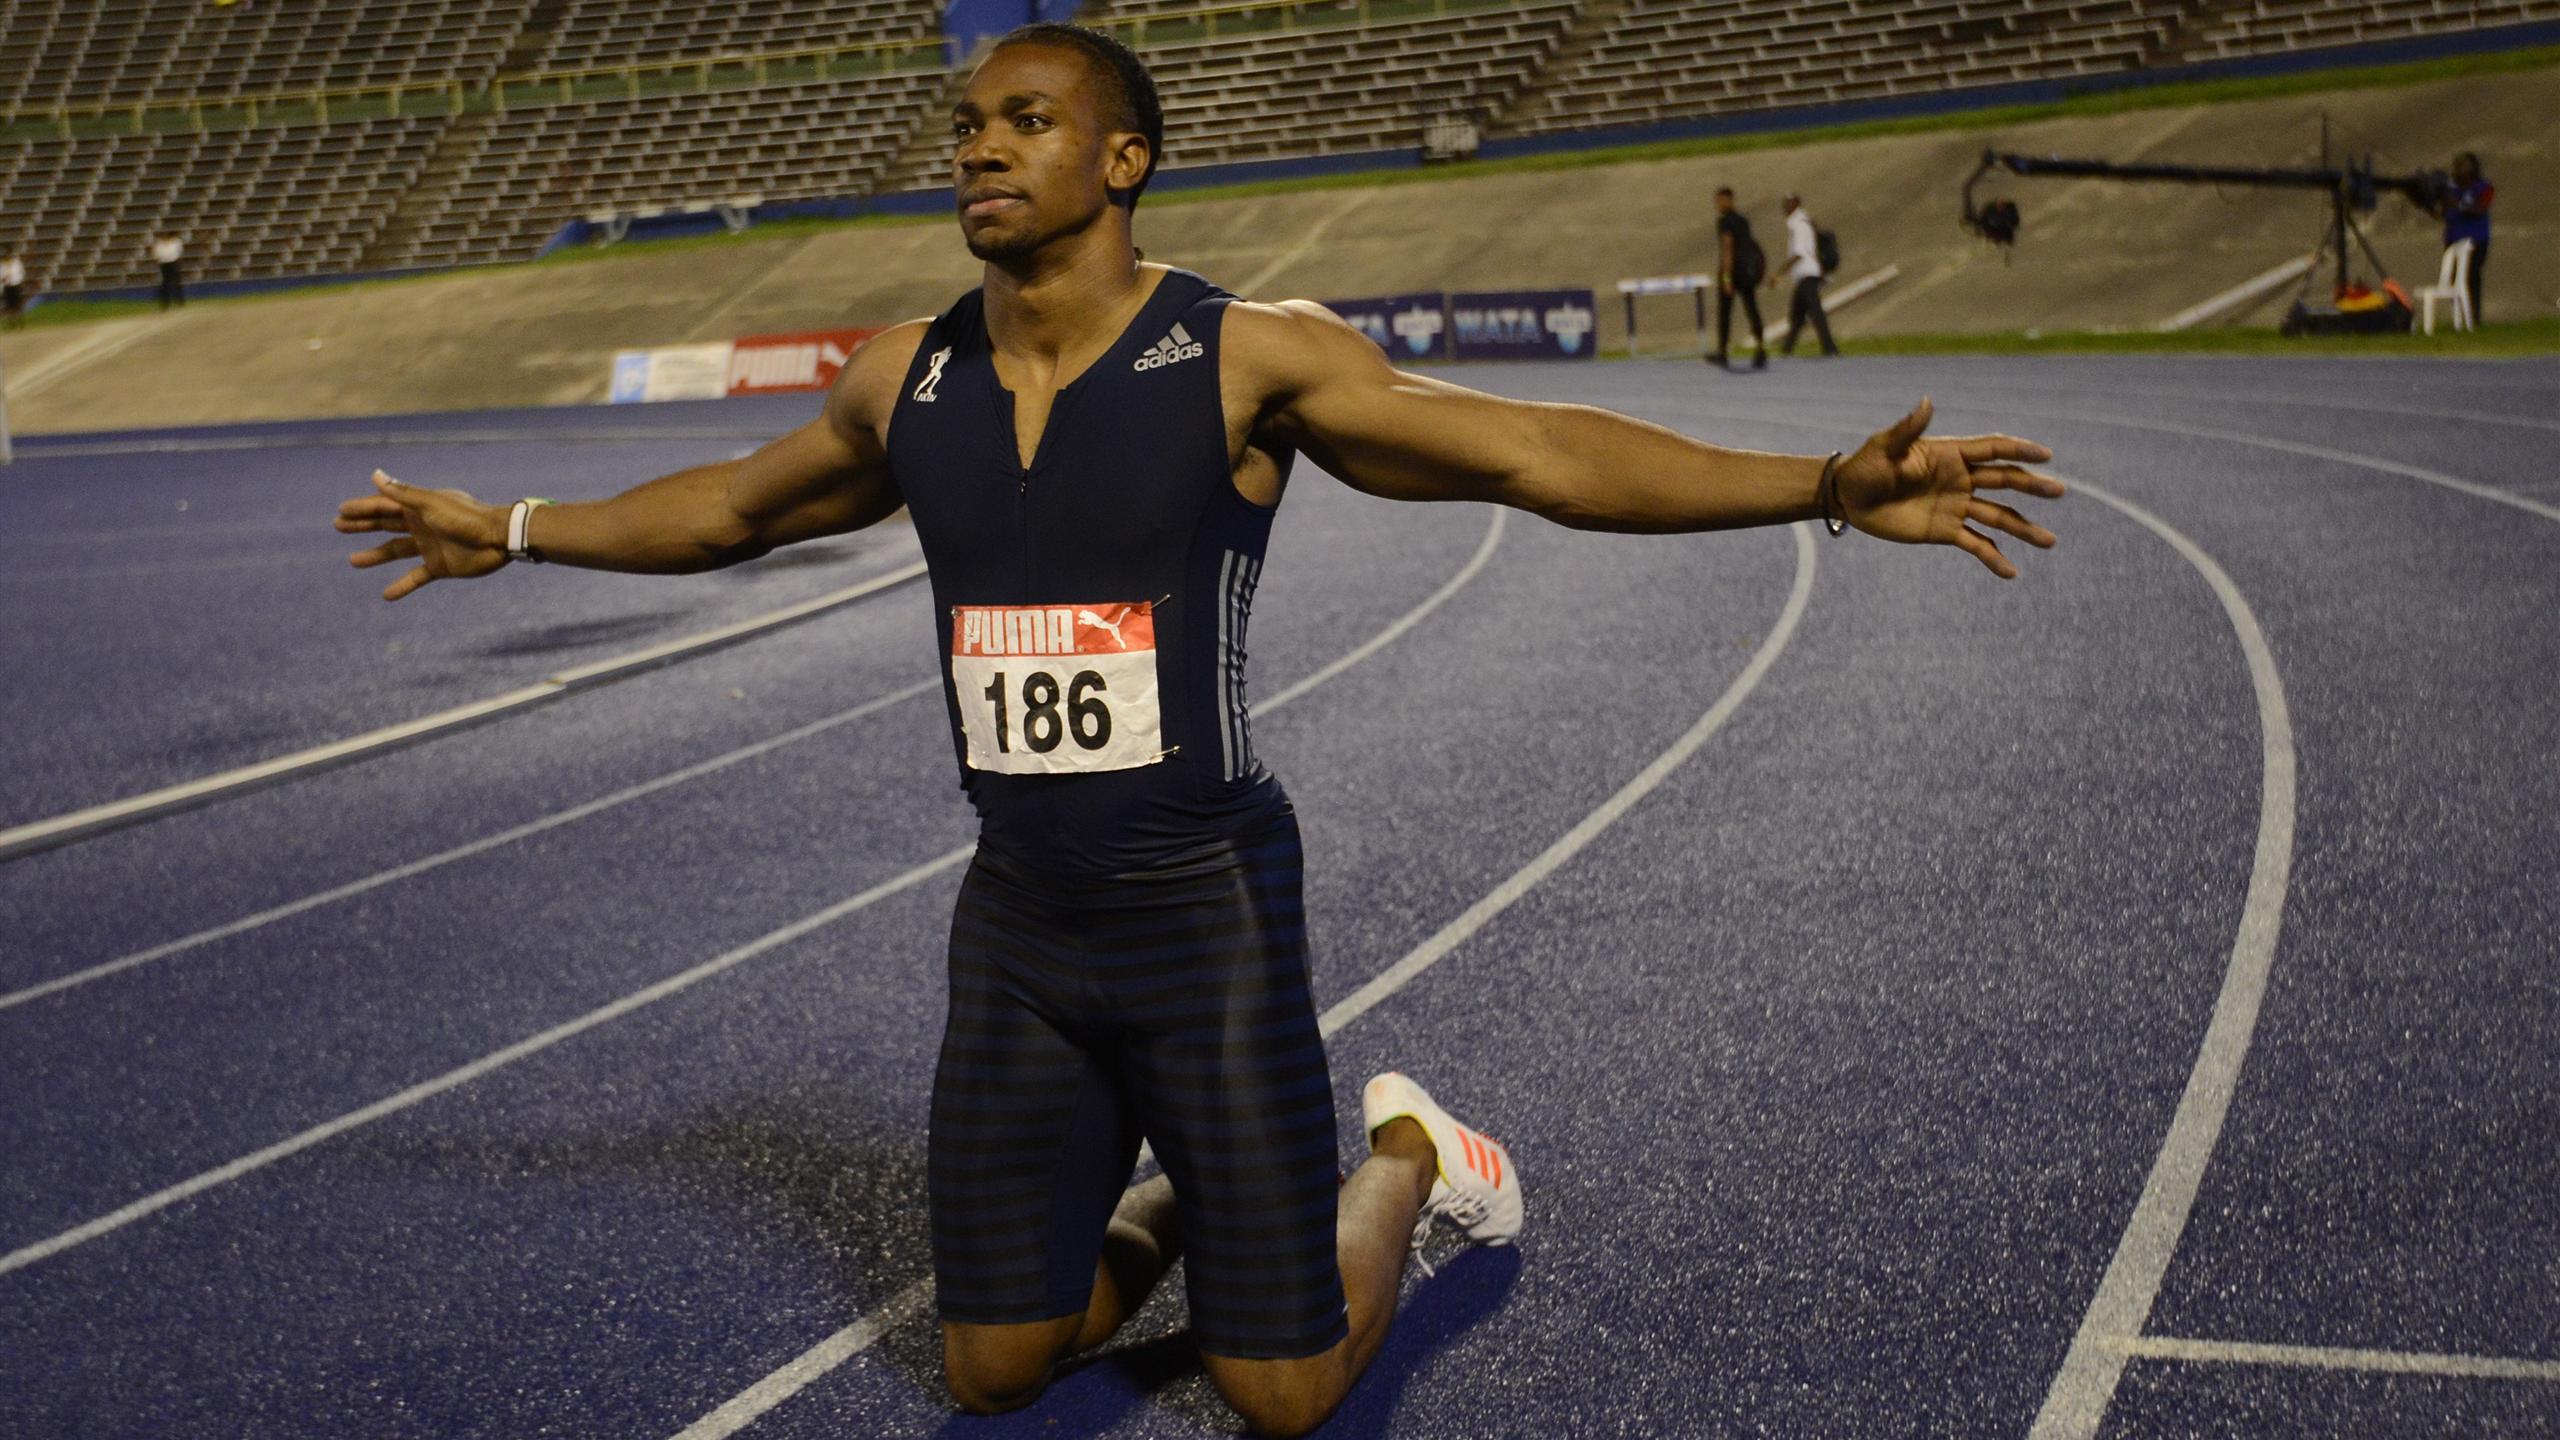 Yohan Blake returns to sub-20 club to complete Jamaican sprint double - Athletics - Eurosport